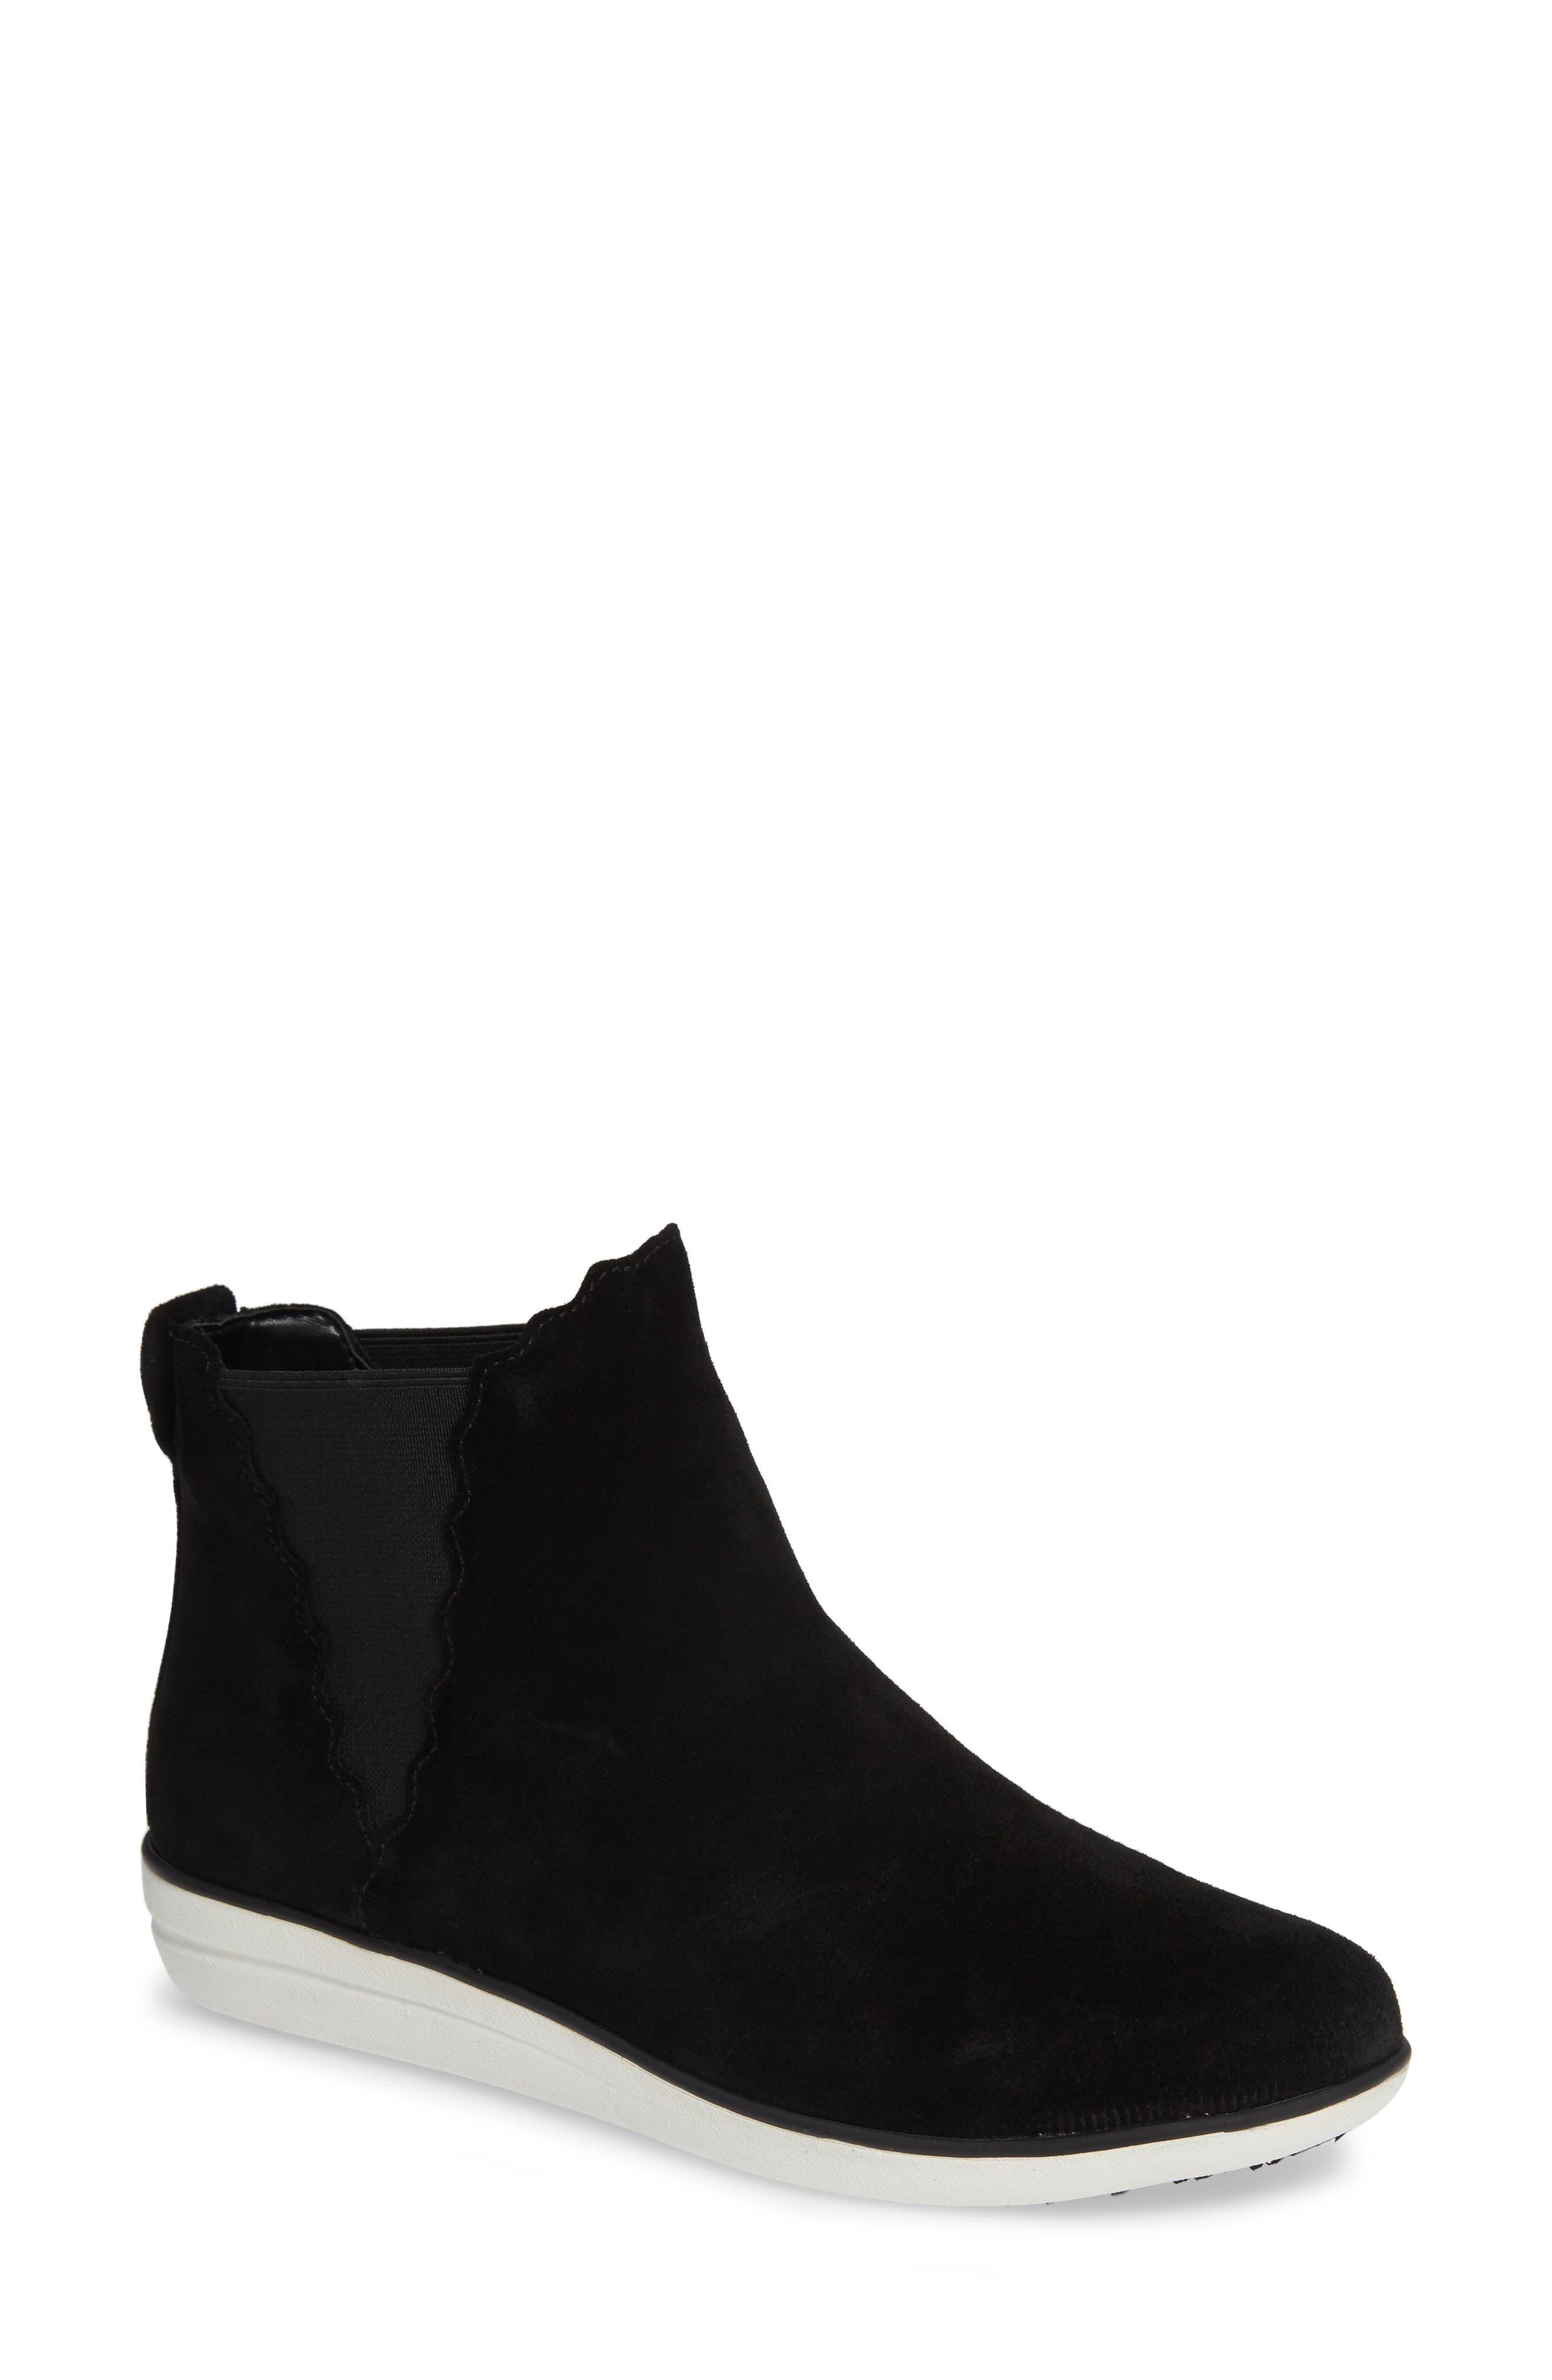 Aetrex Alanna Slip-On High Top Sneaker - Black